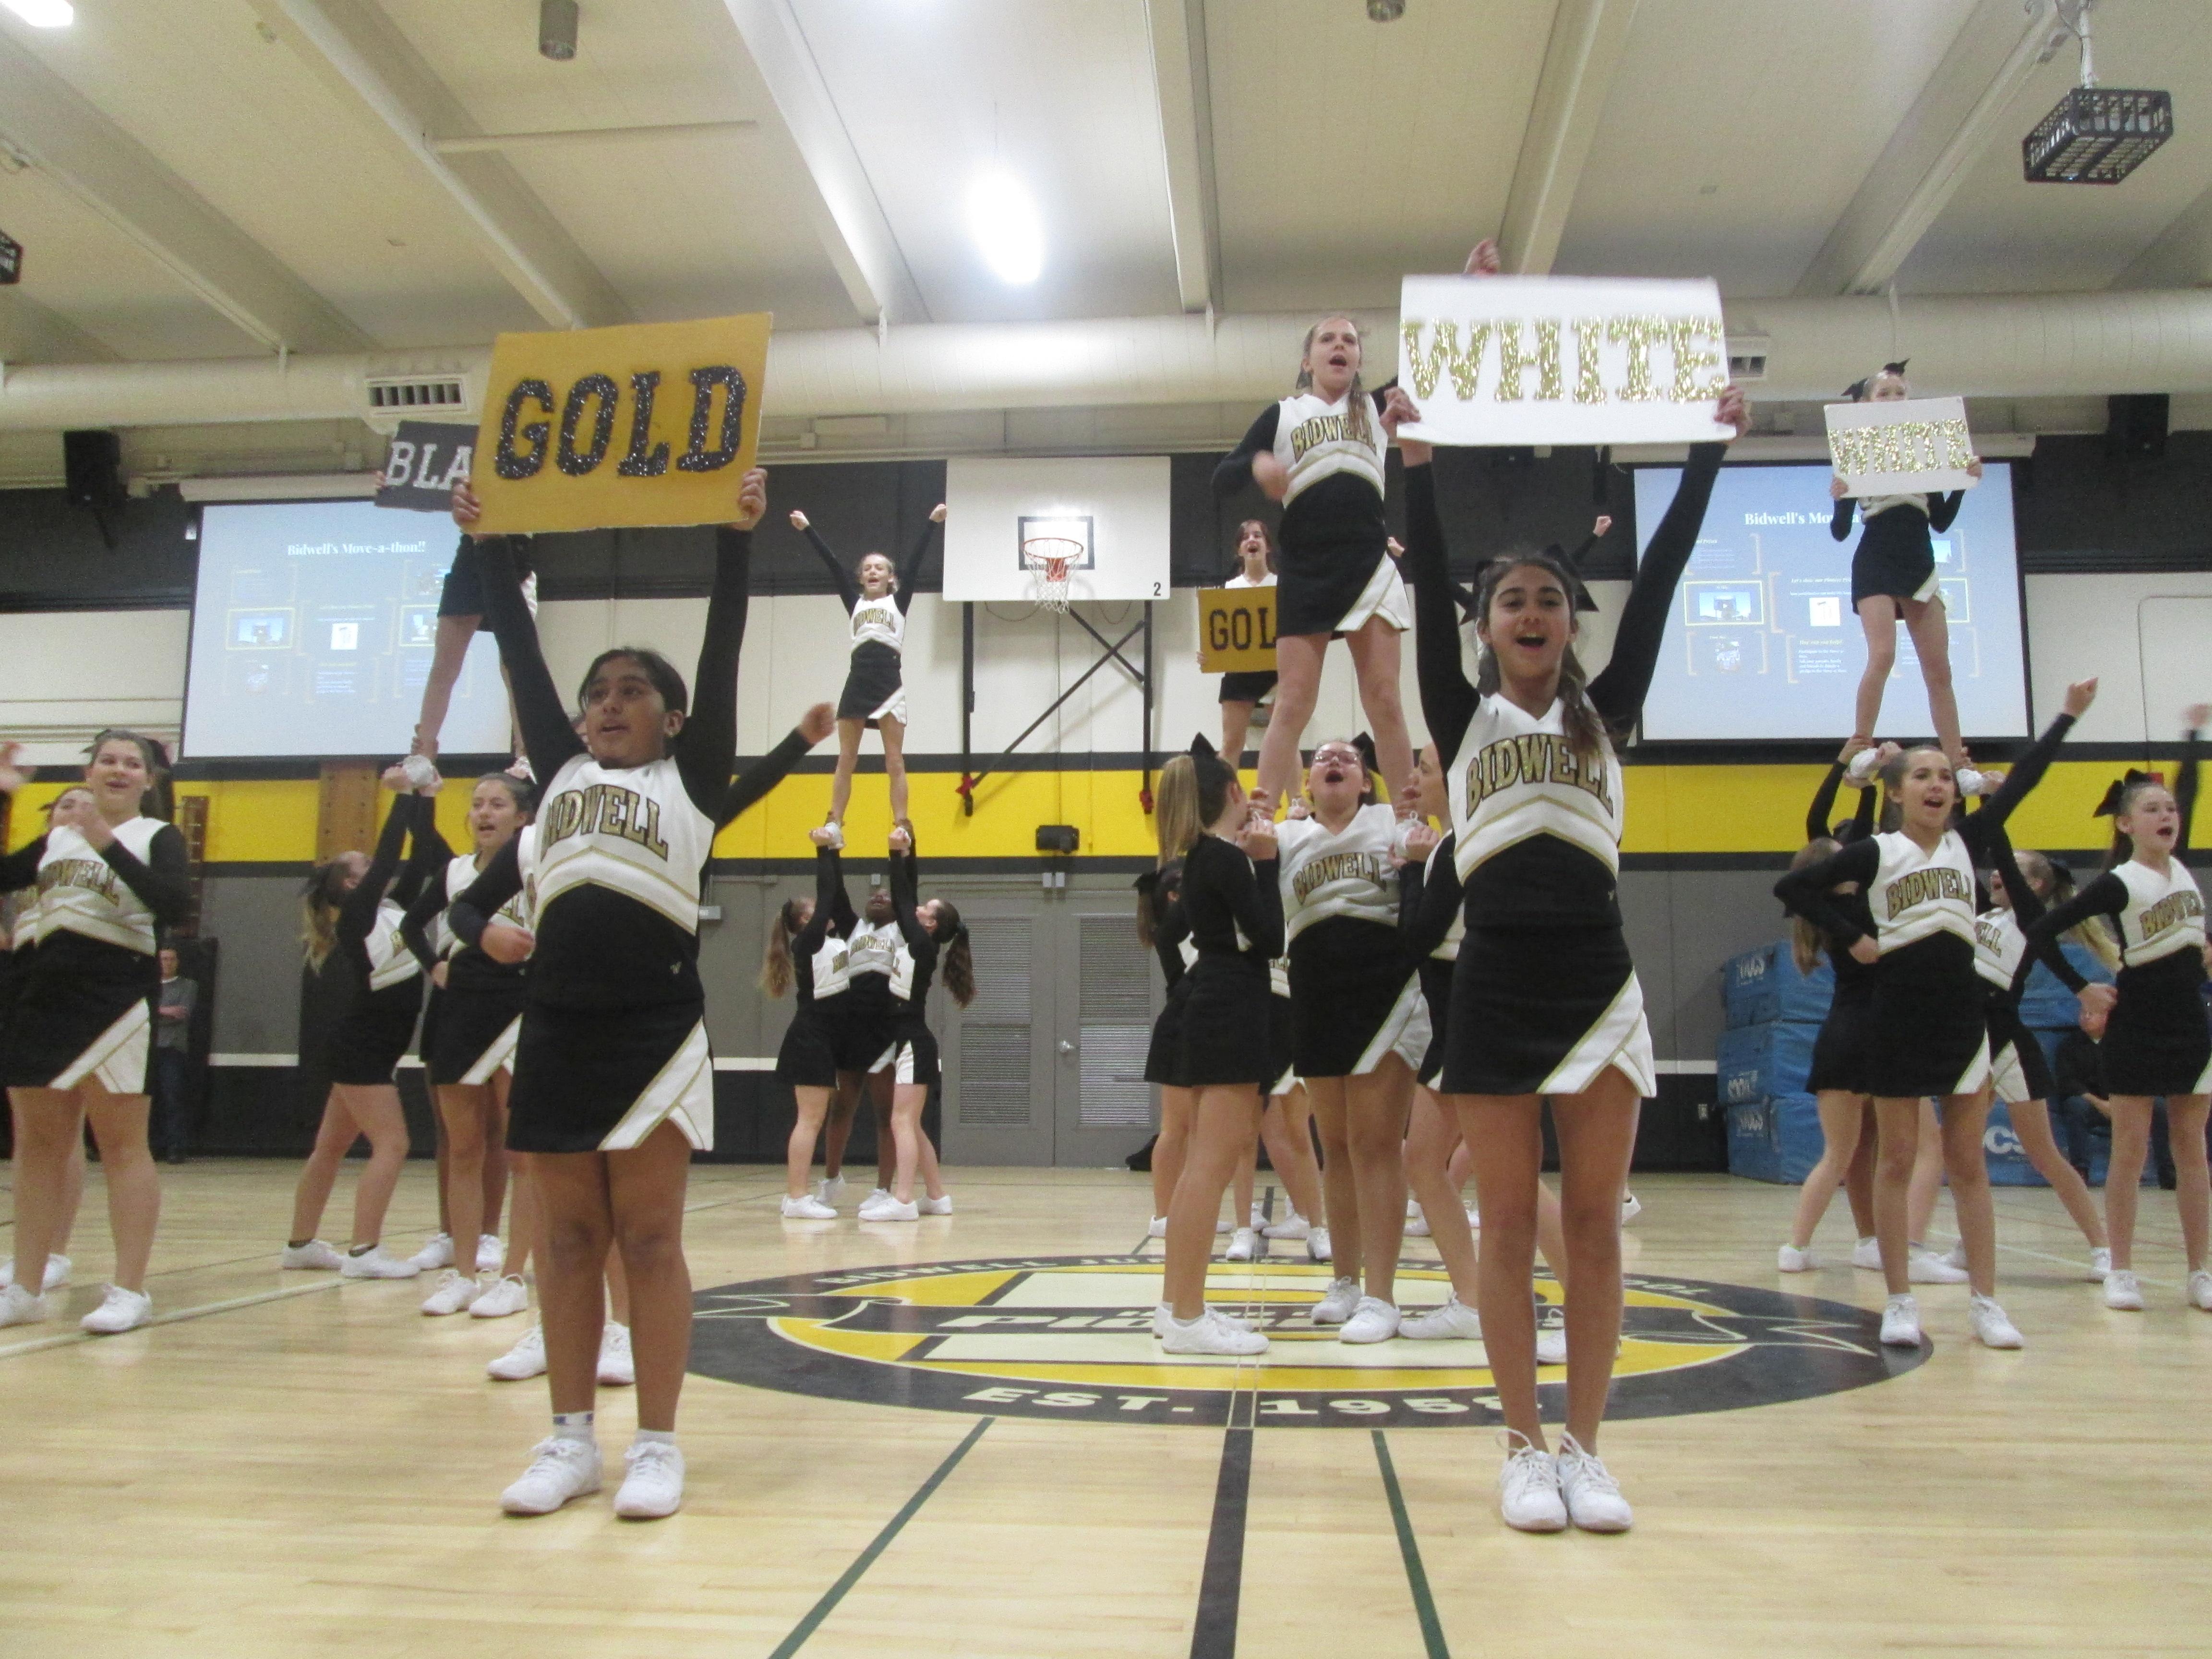 Bidwell Junior High School School Life